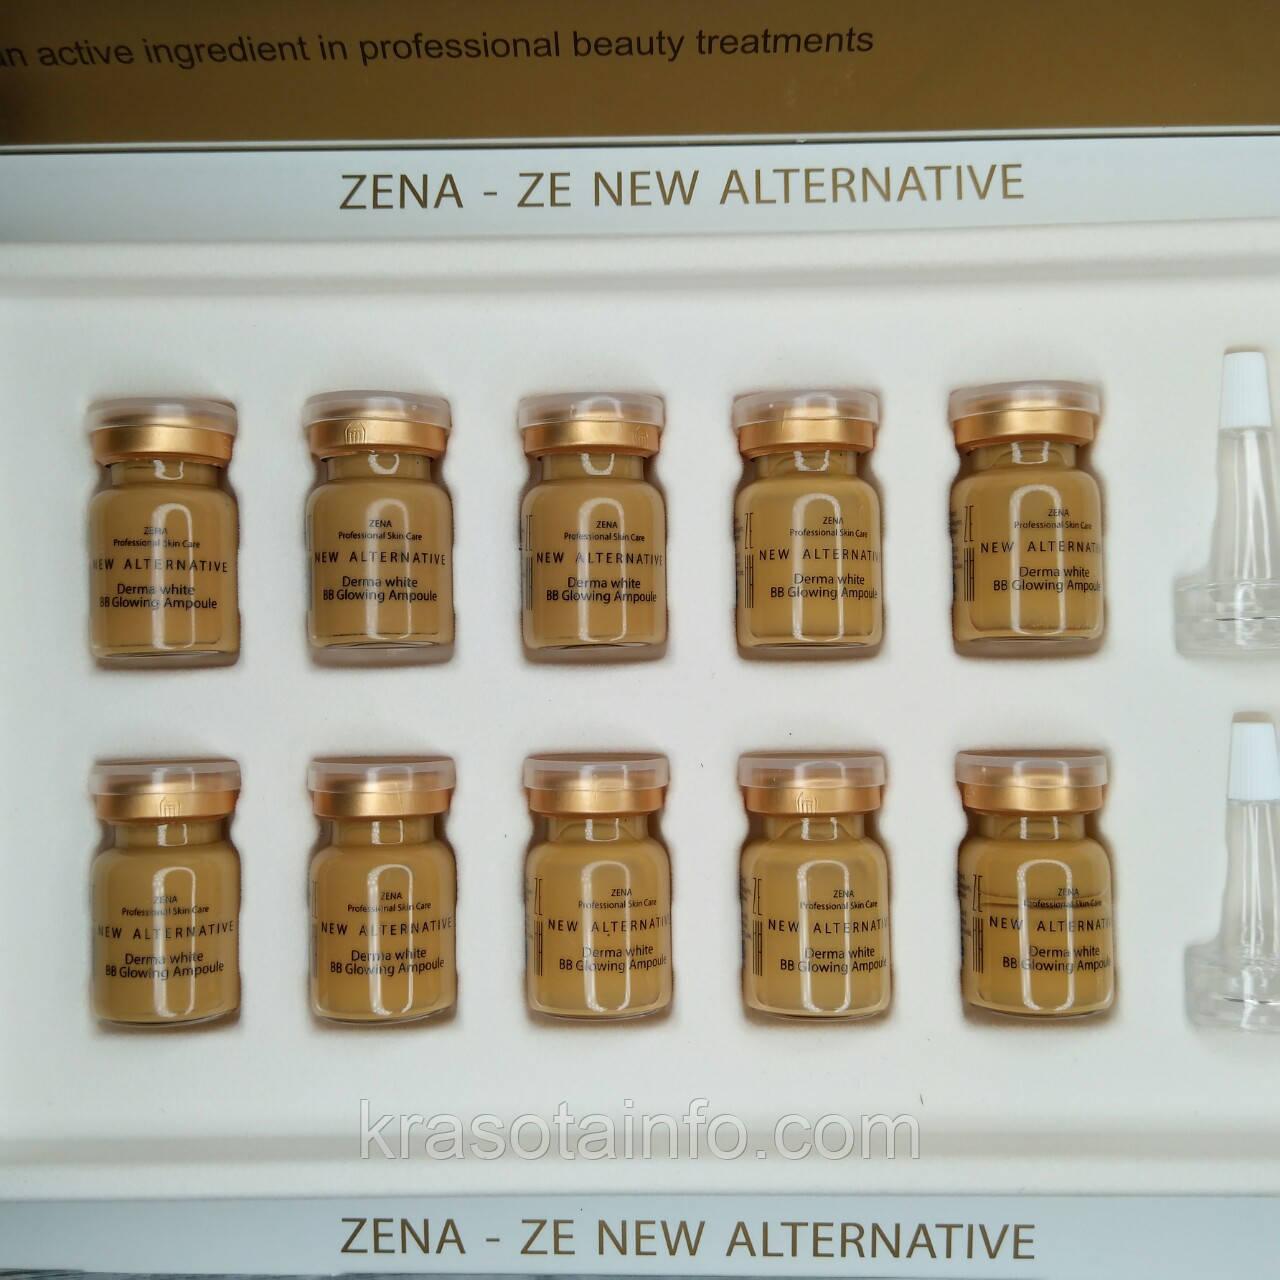 Набор BB glow Zena № 25 treatment ББ мезо для процедуры биби глоу BB meso white skin, Zena, 5 мл, 10 штук, фото 1